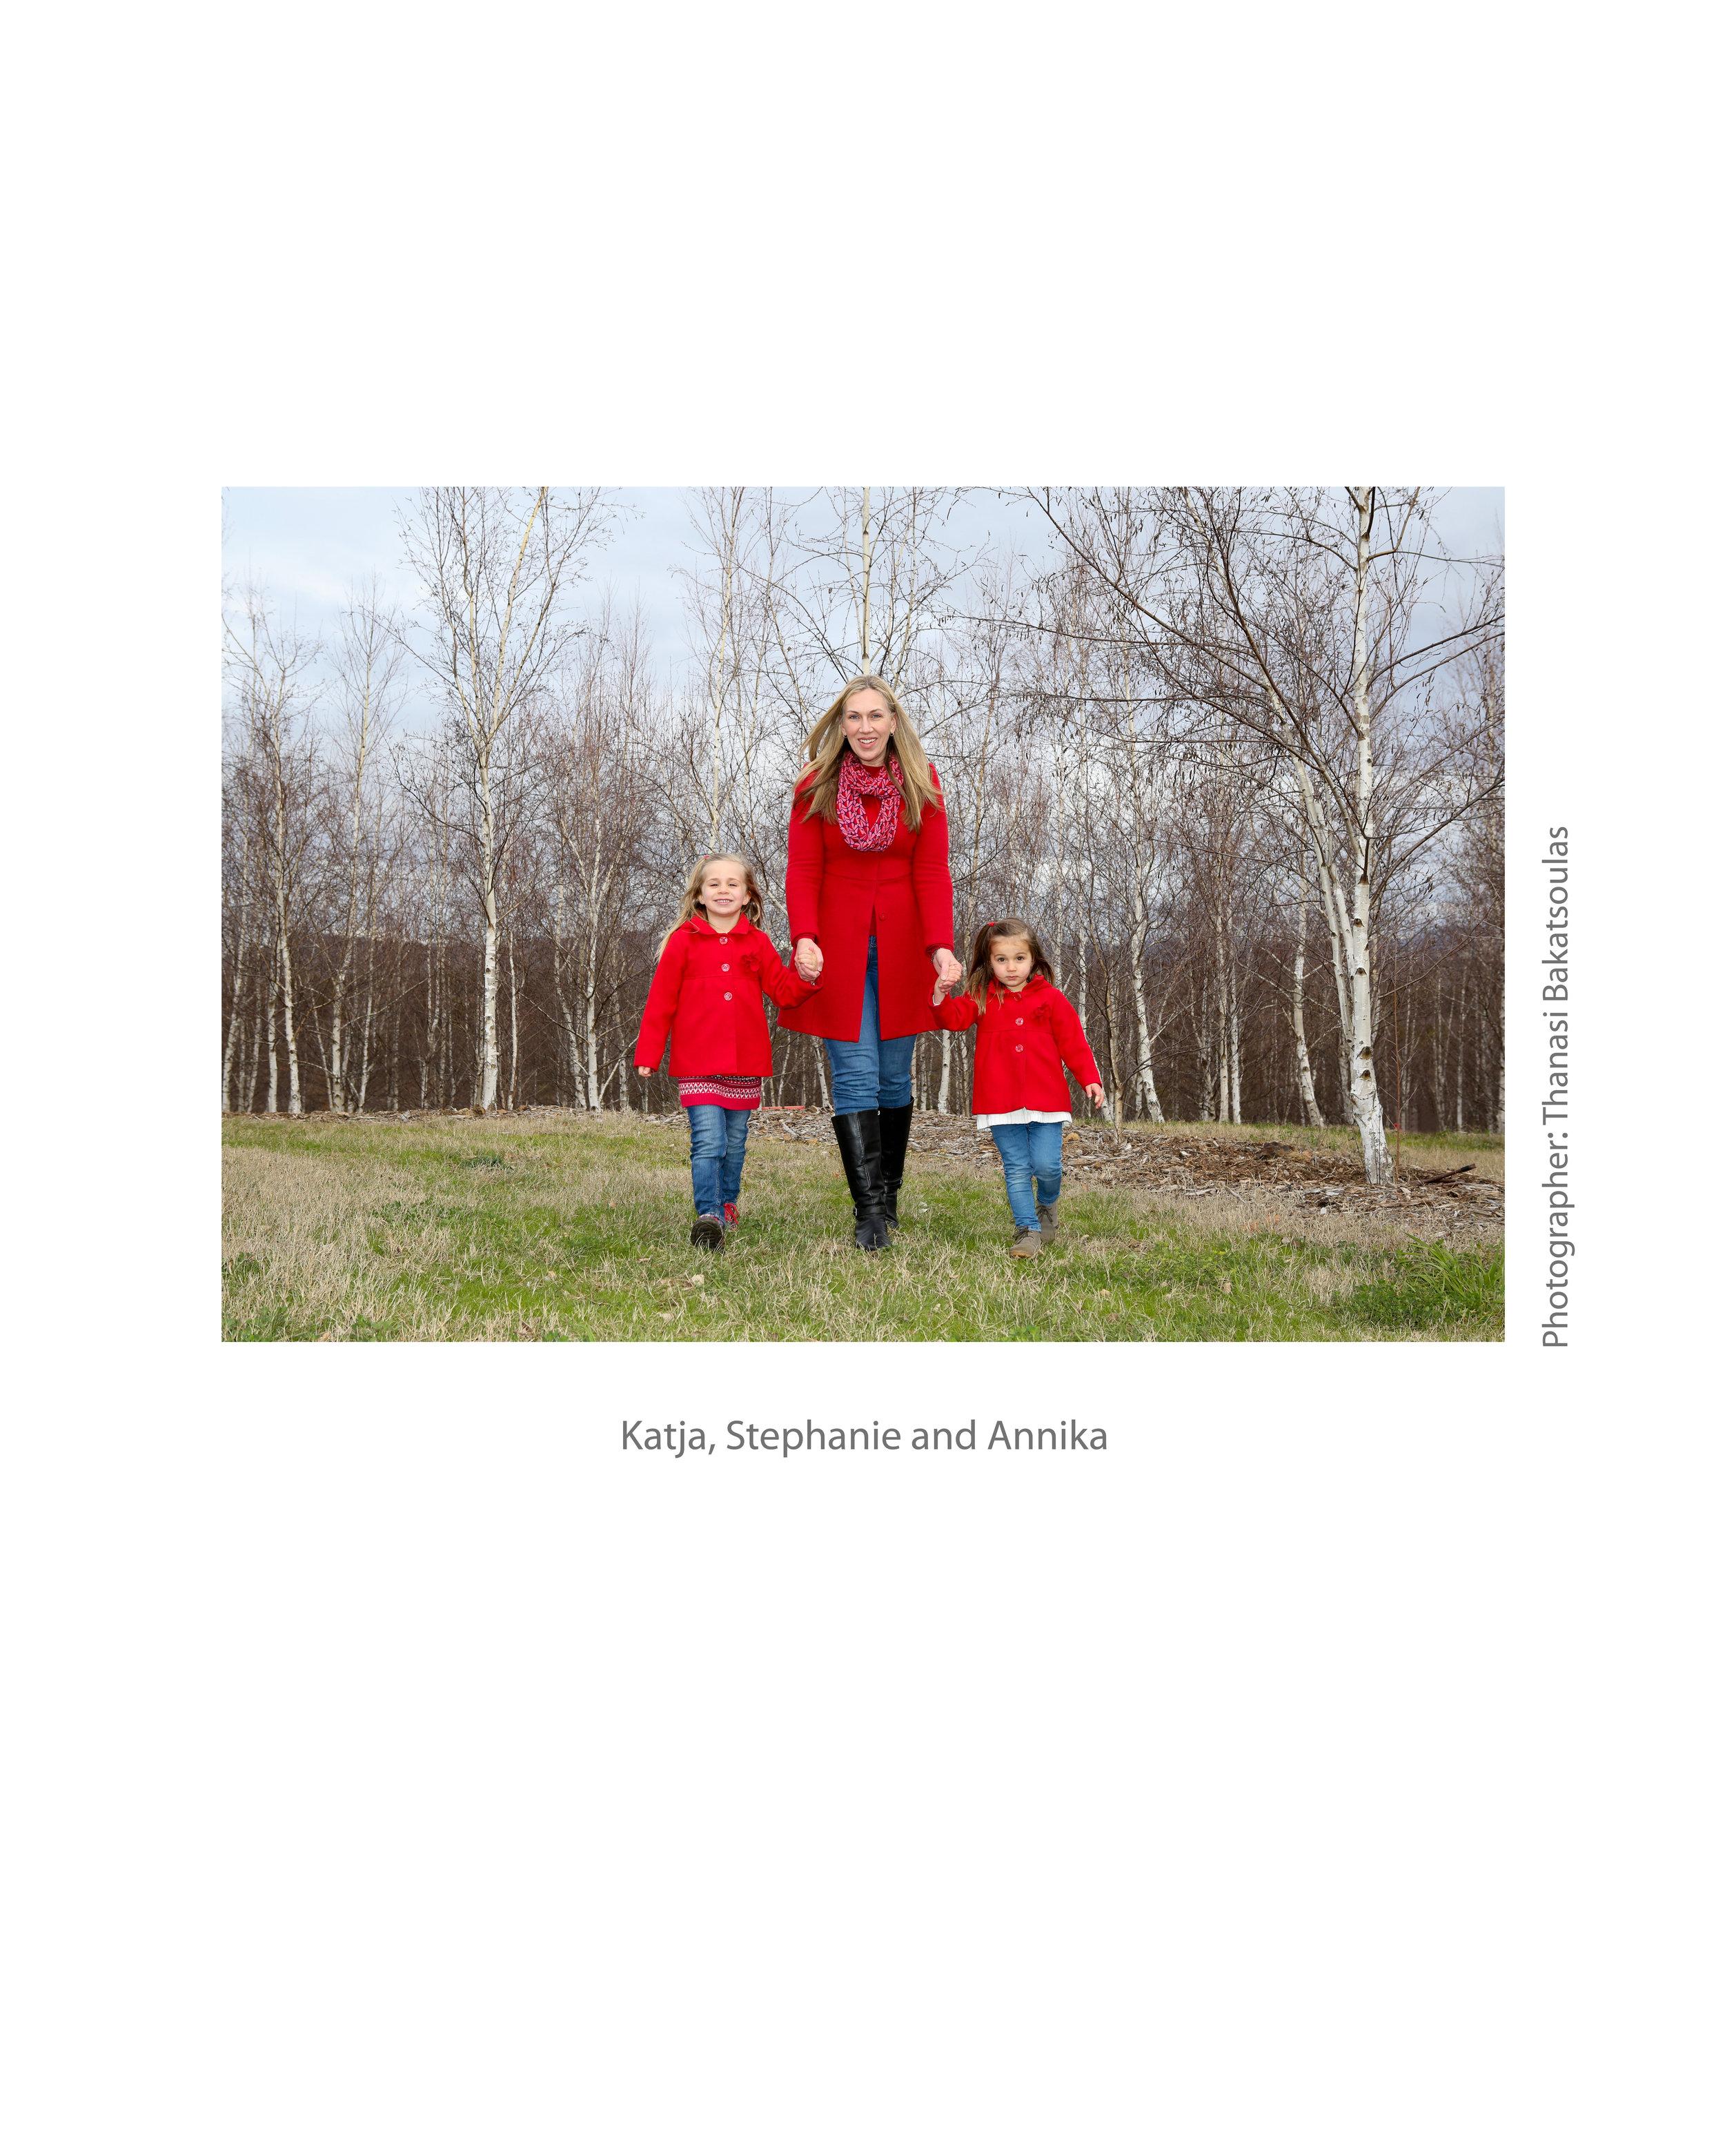 Katja, Stephanie and Annika.jpg